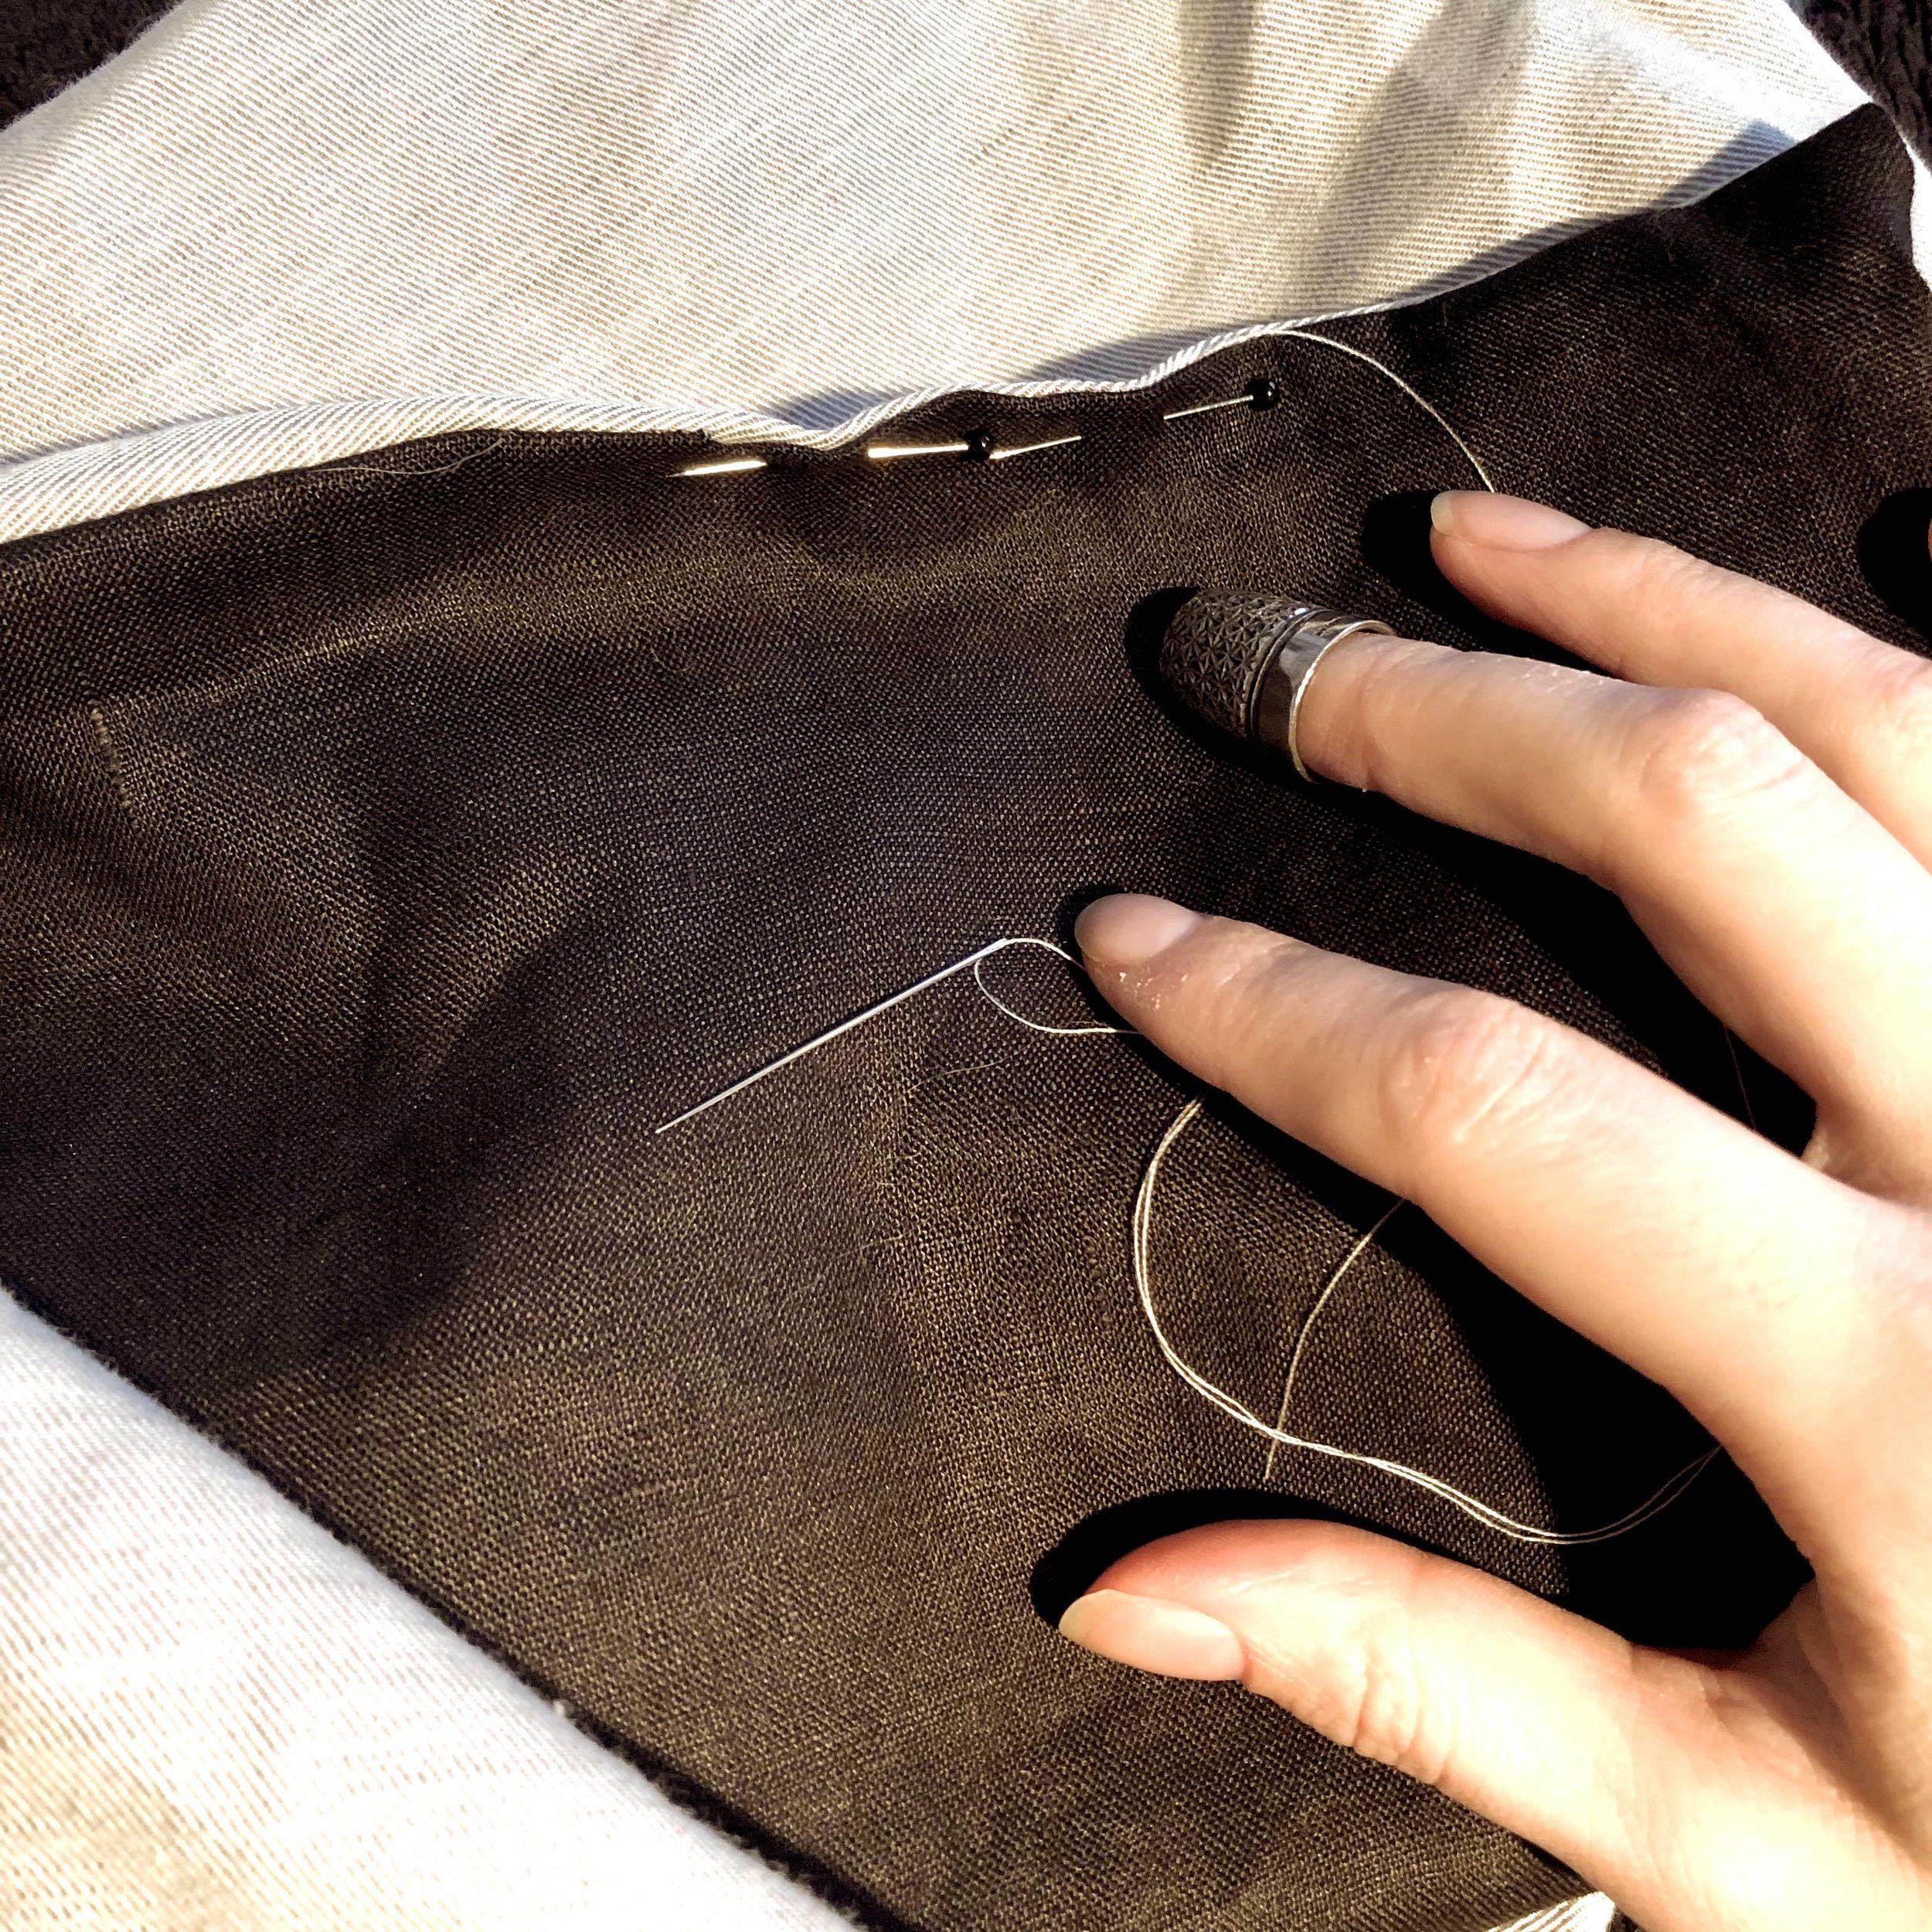 11_Hand_Sewing.jpg